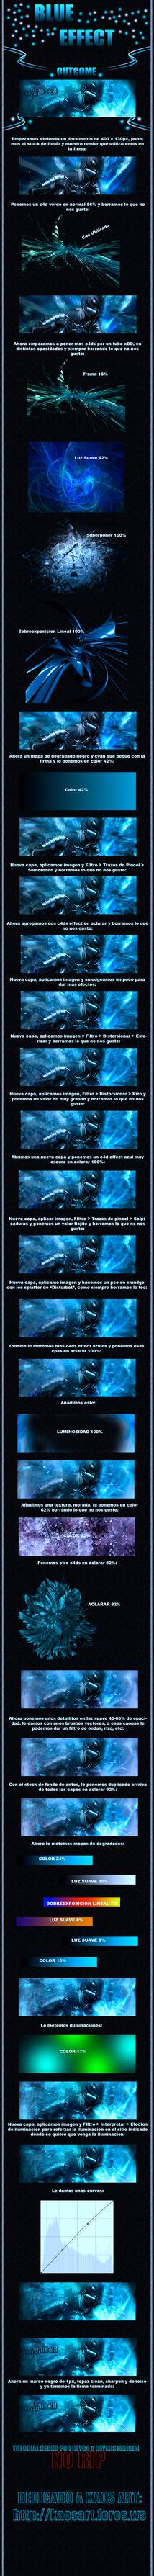 Blue Effect by Rey94Design